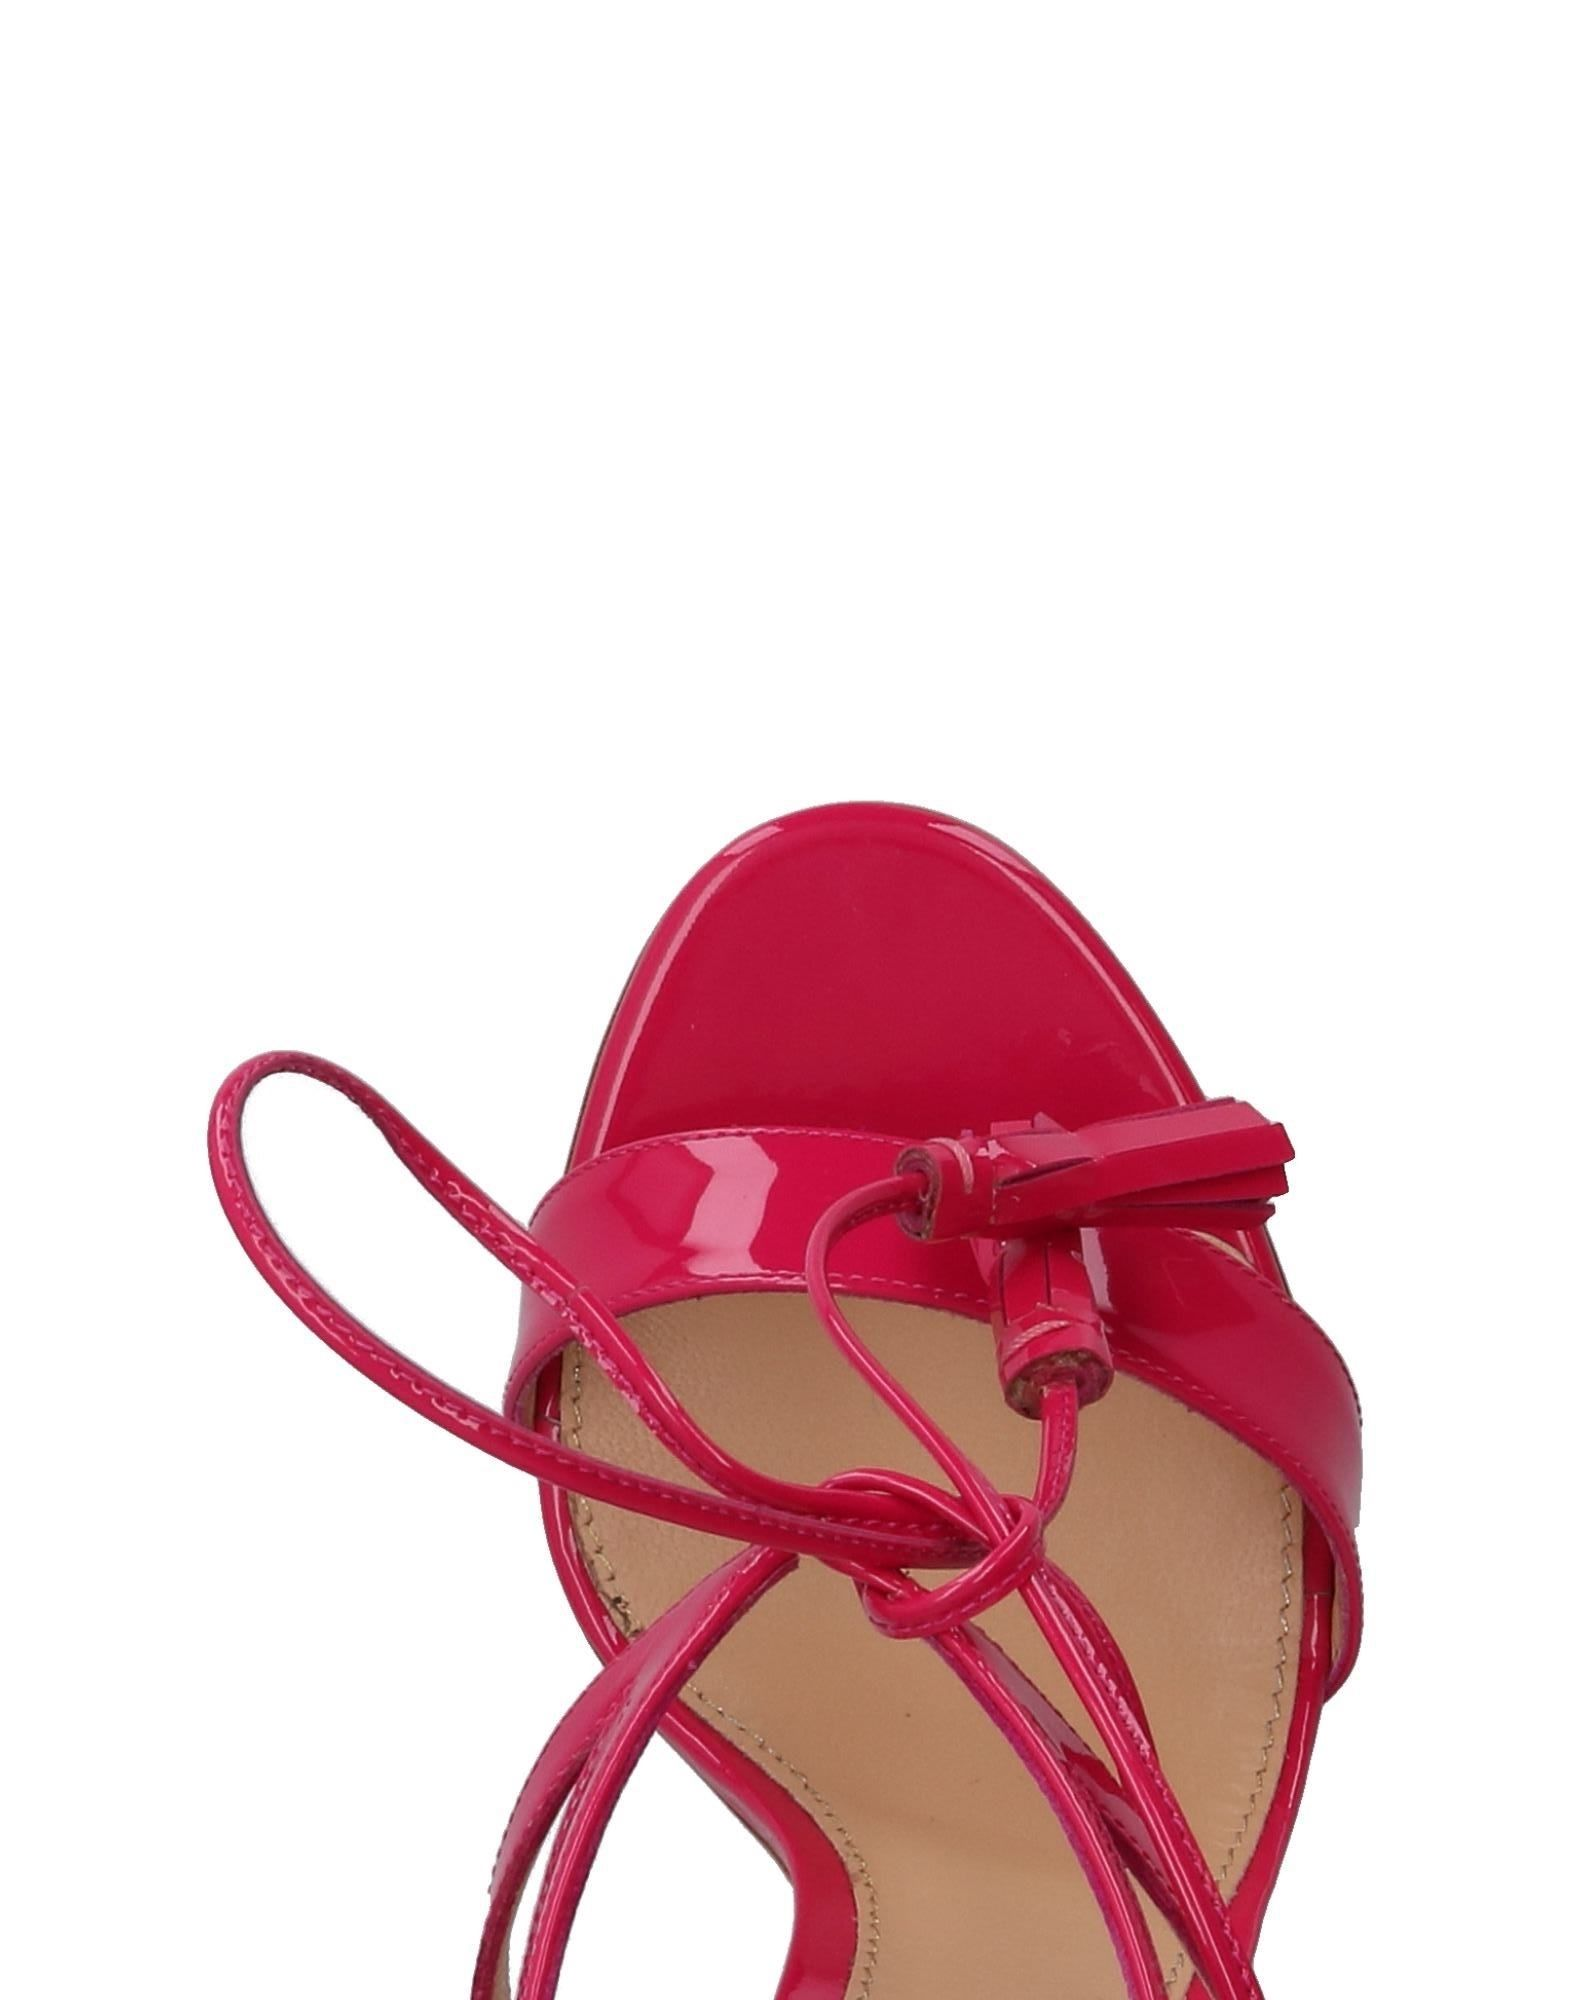 Sandales Lerre Femme - Sandales Lerre sur